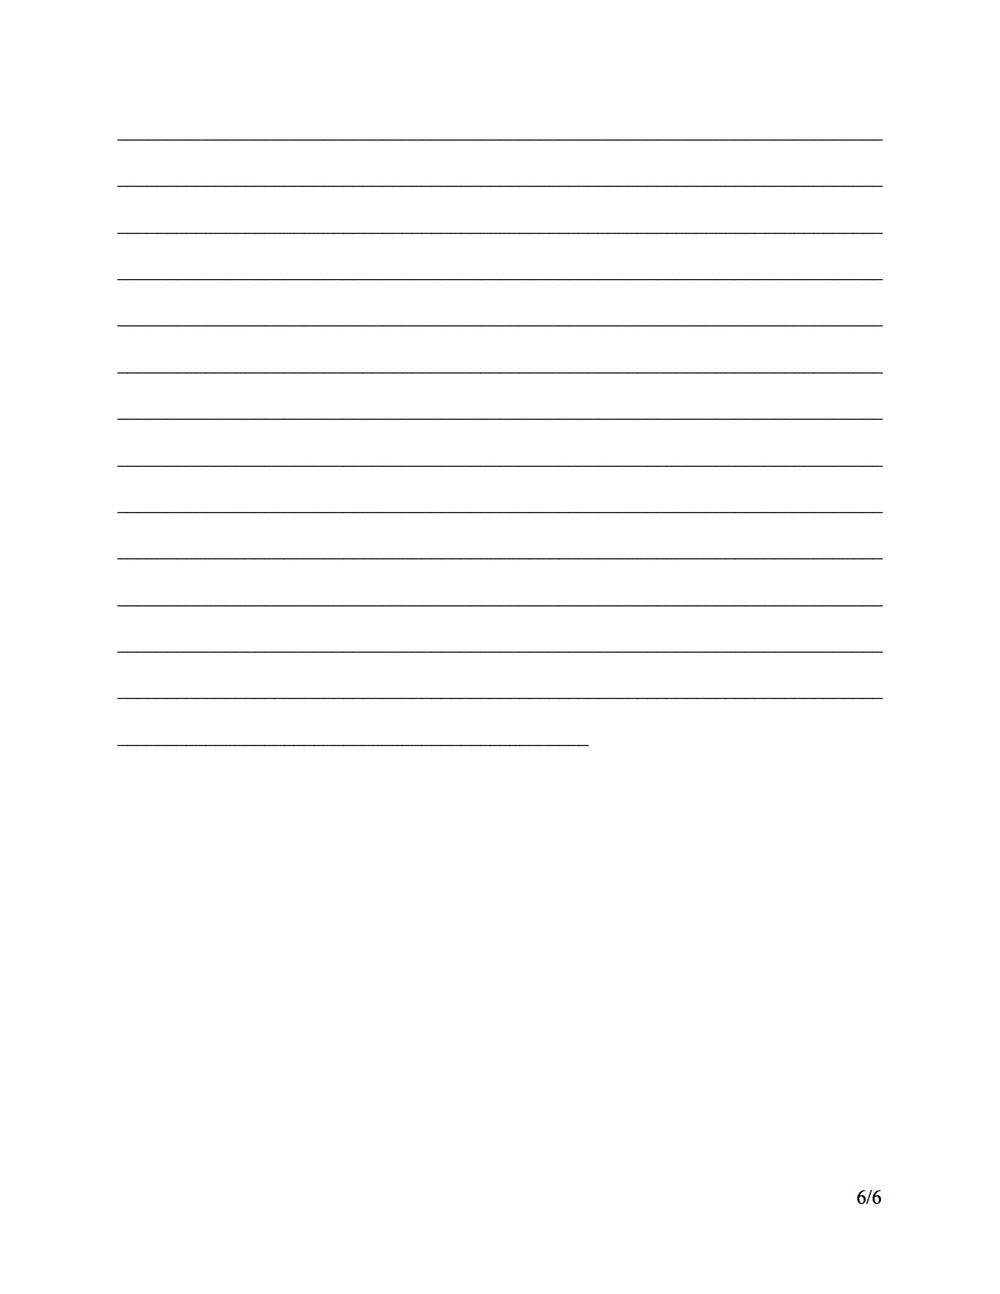 test page 6.jpg